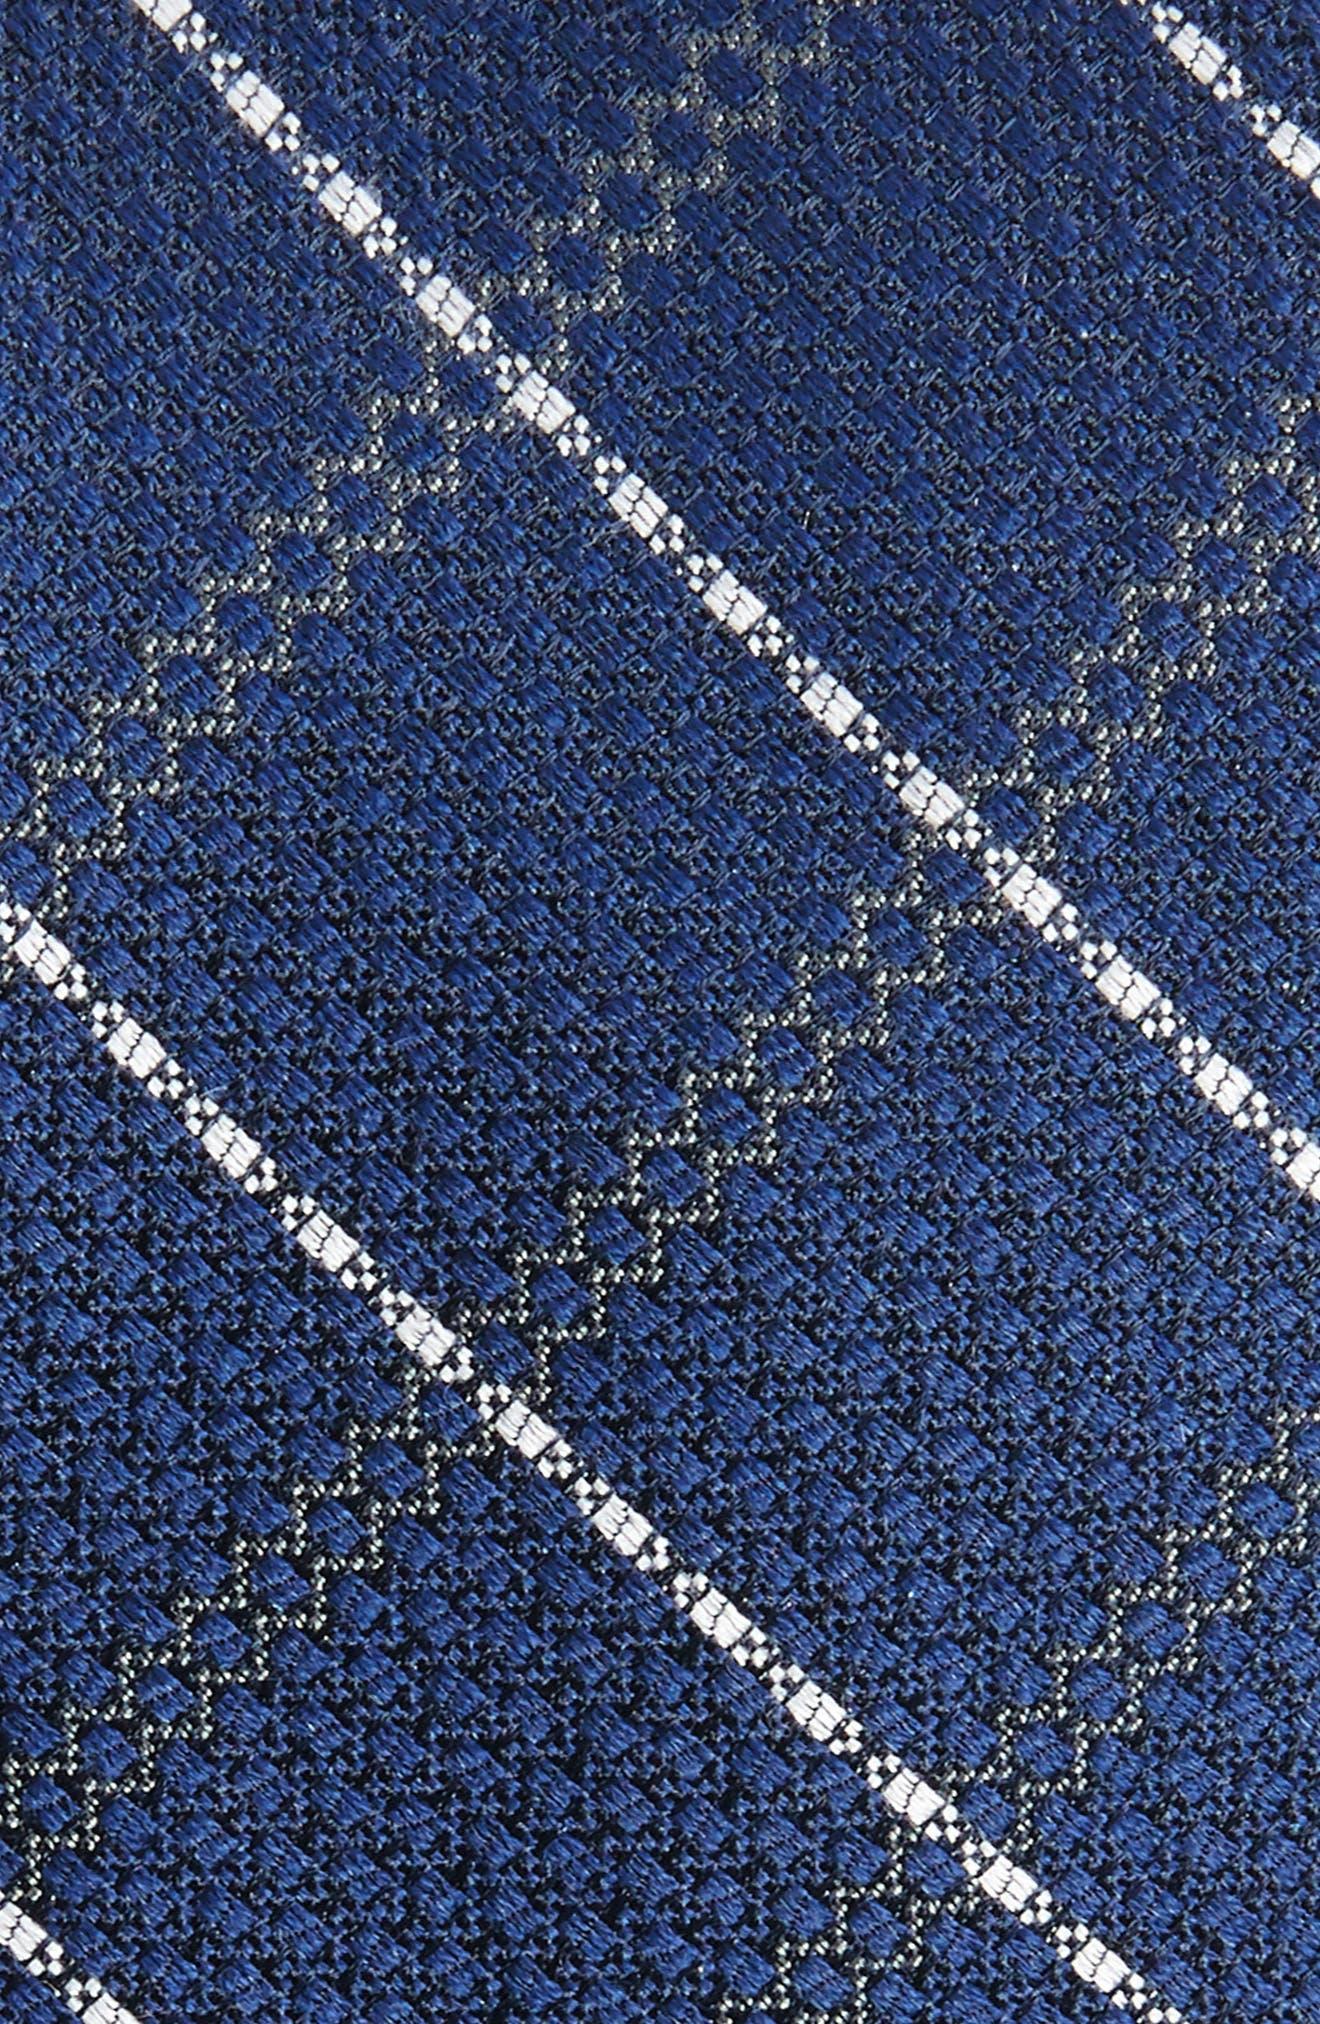 Plaid Silk & Wool Tie,                             Alternate thumbnail 2, color,                             NAVY